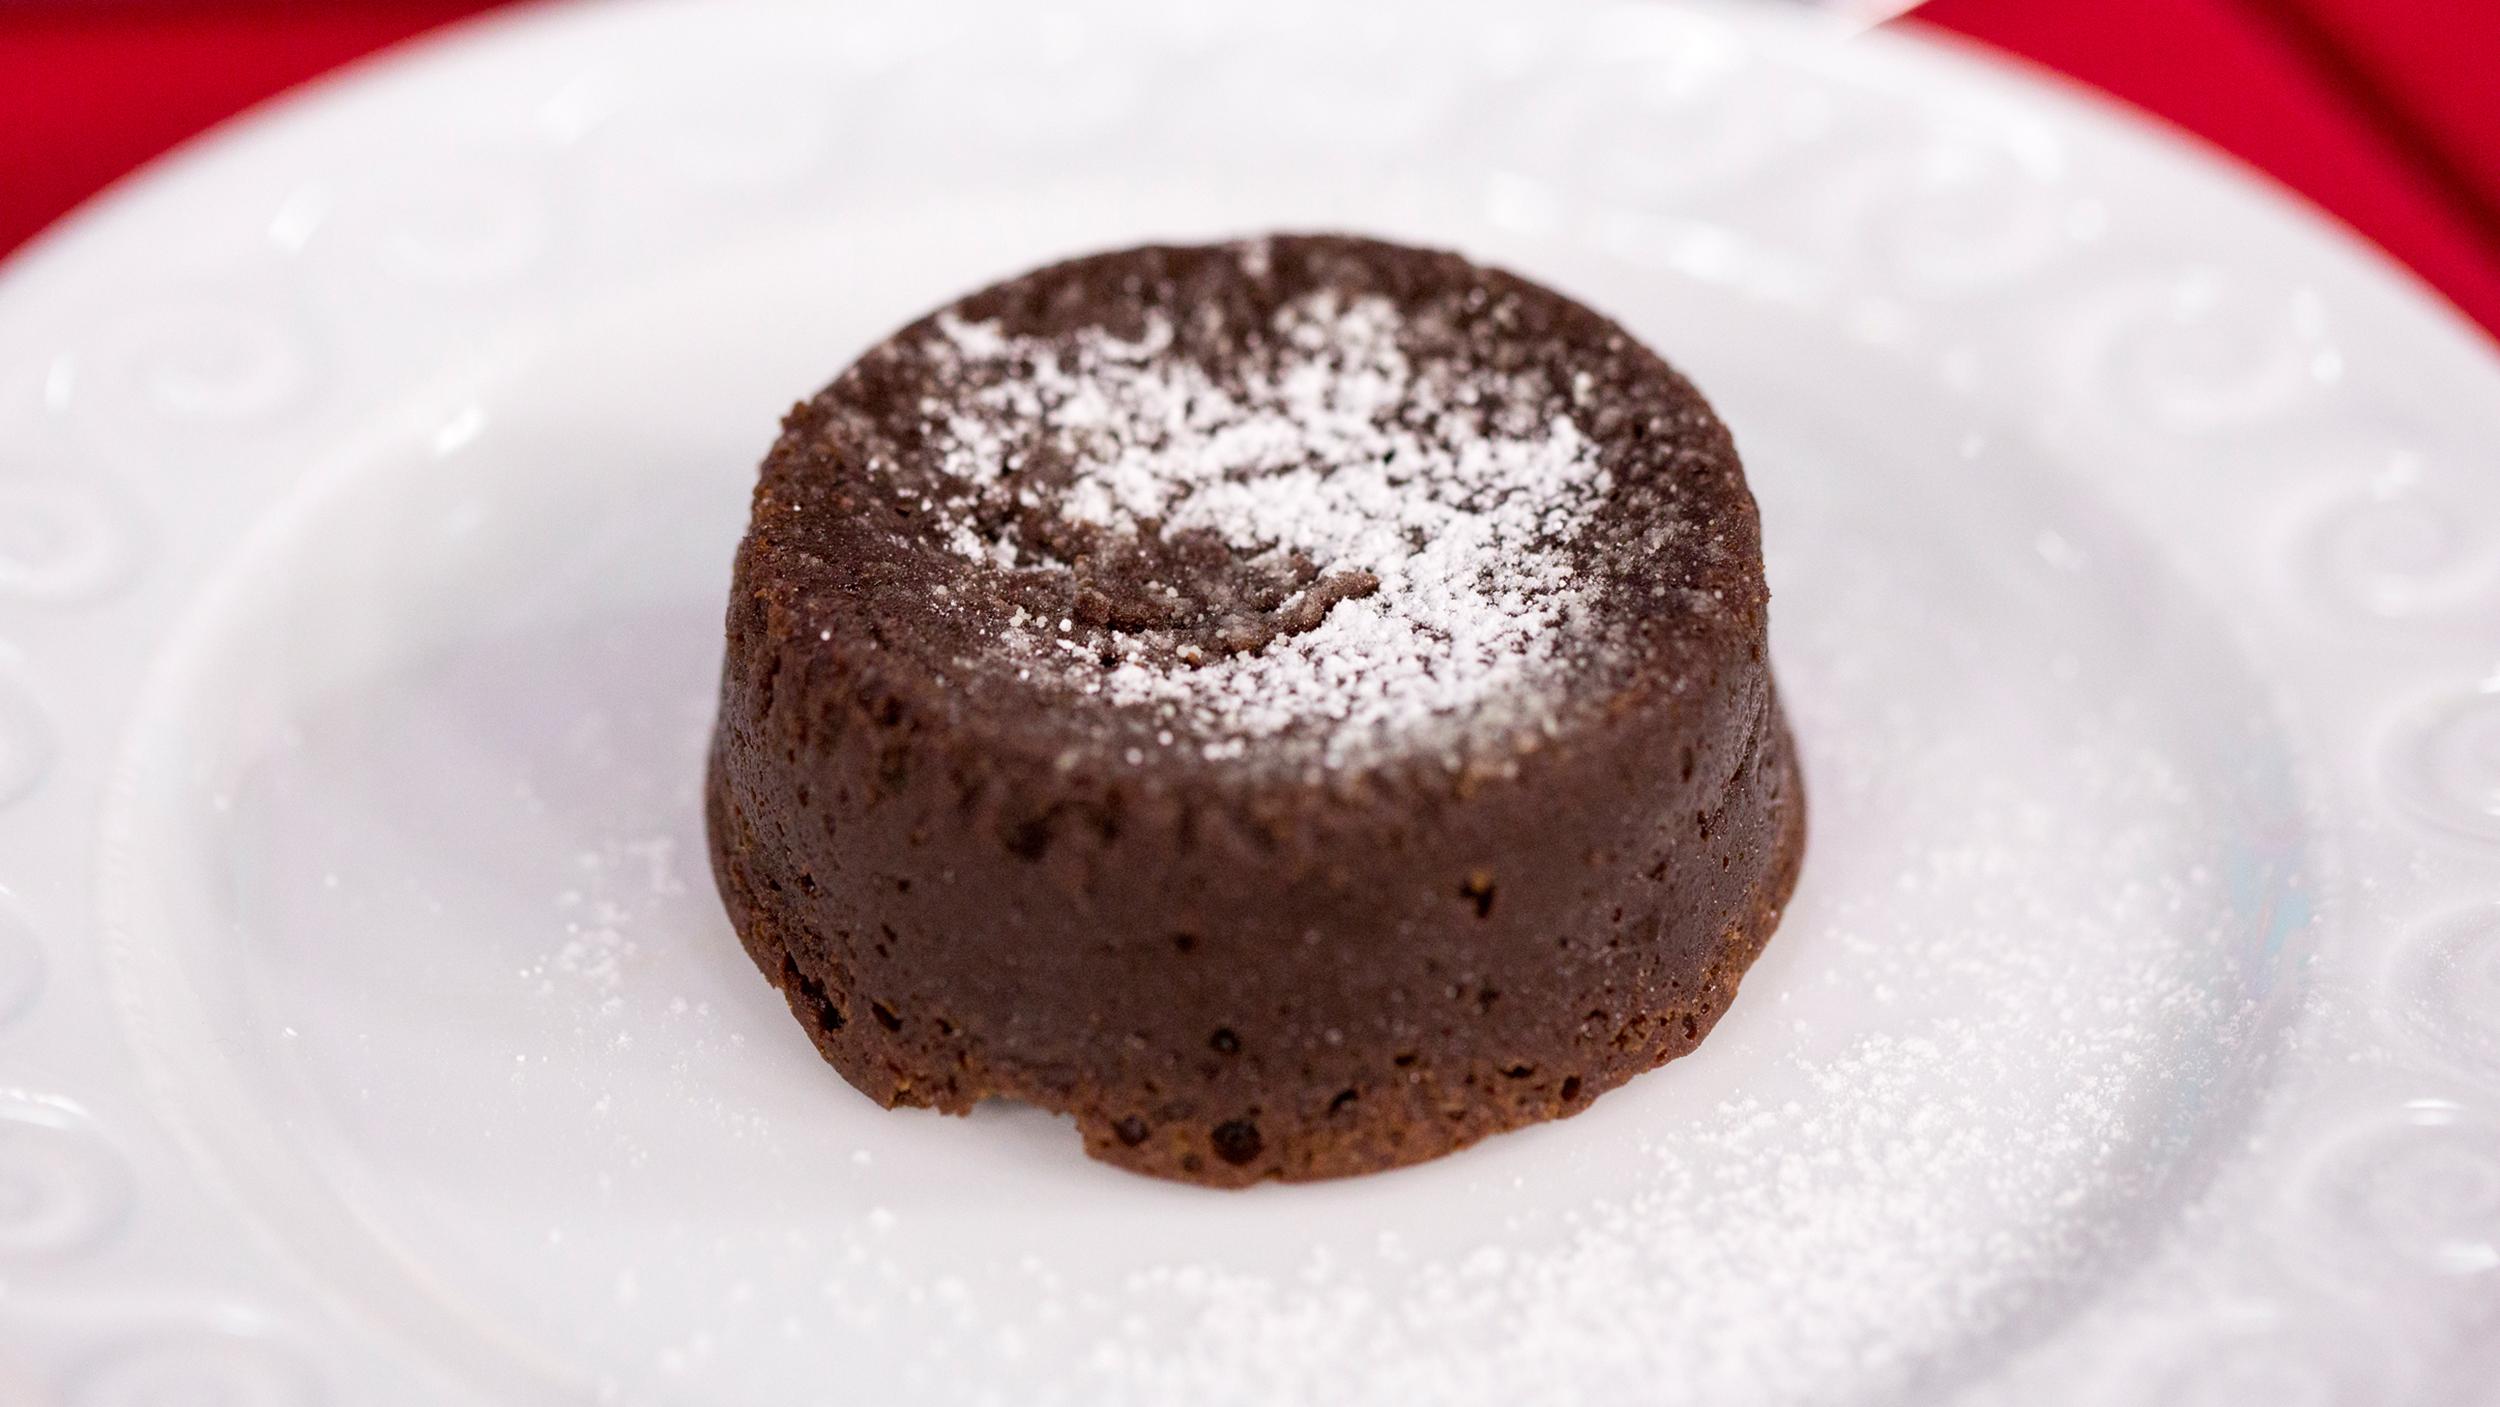 Easy Flourless Chocolate Cakes TODAYcom